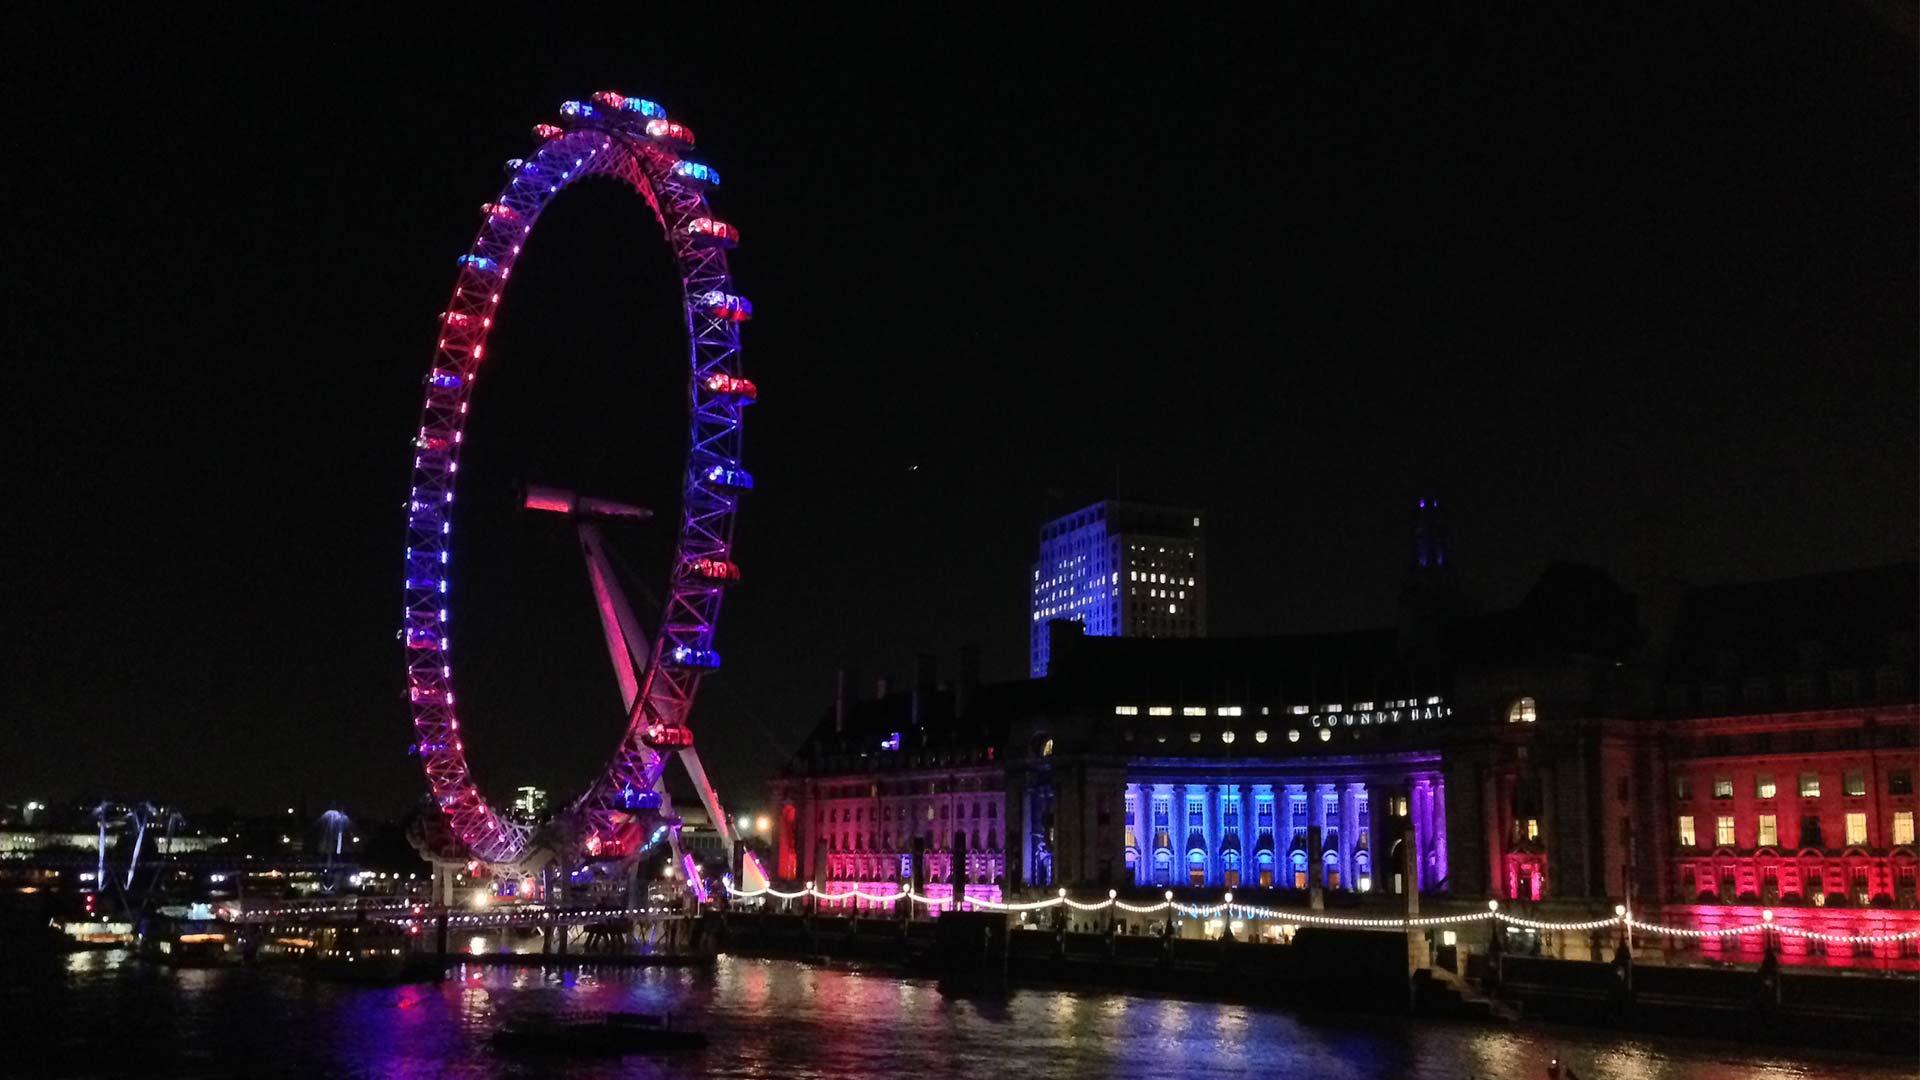 Colourful Lighting Display London Eye Waterloo South Bank Nulty